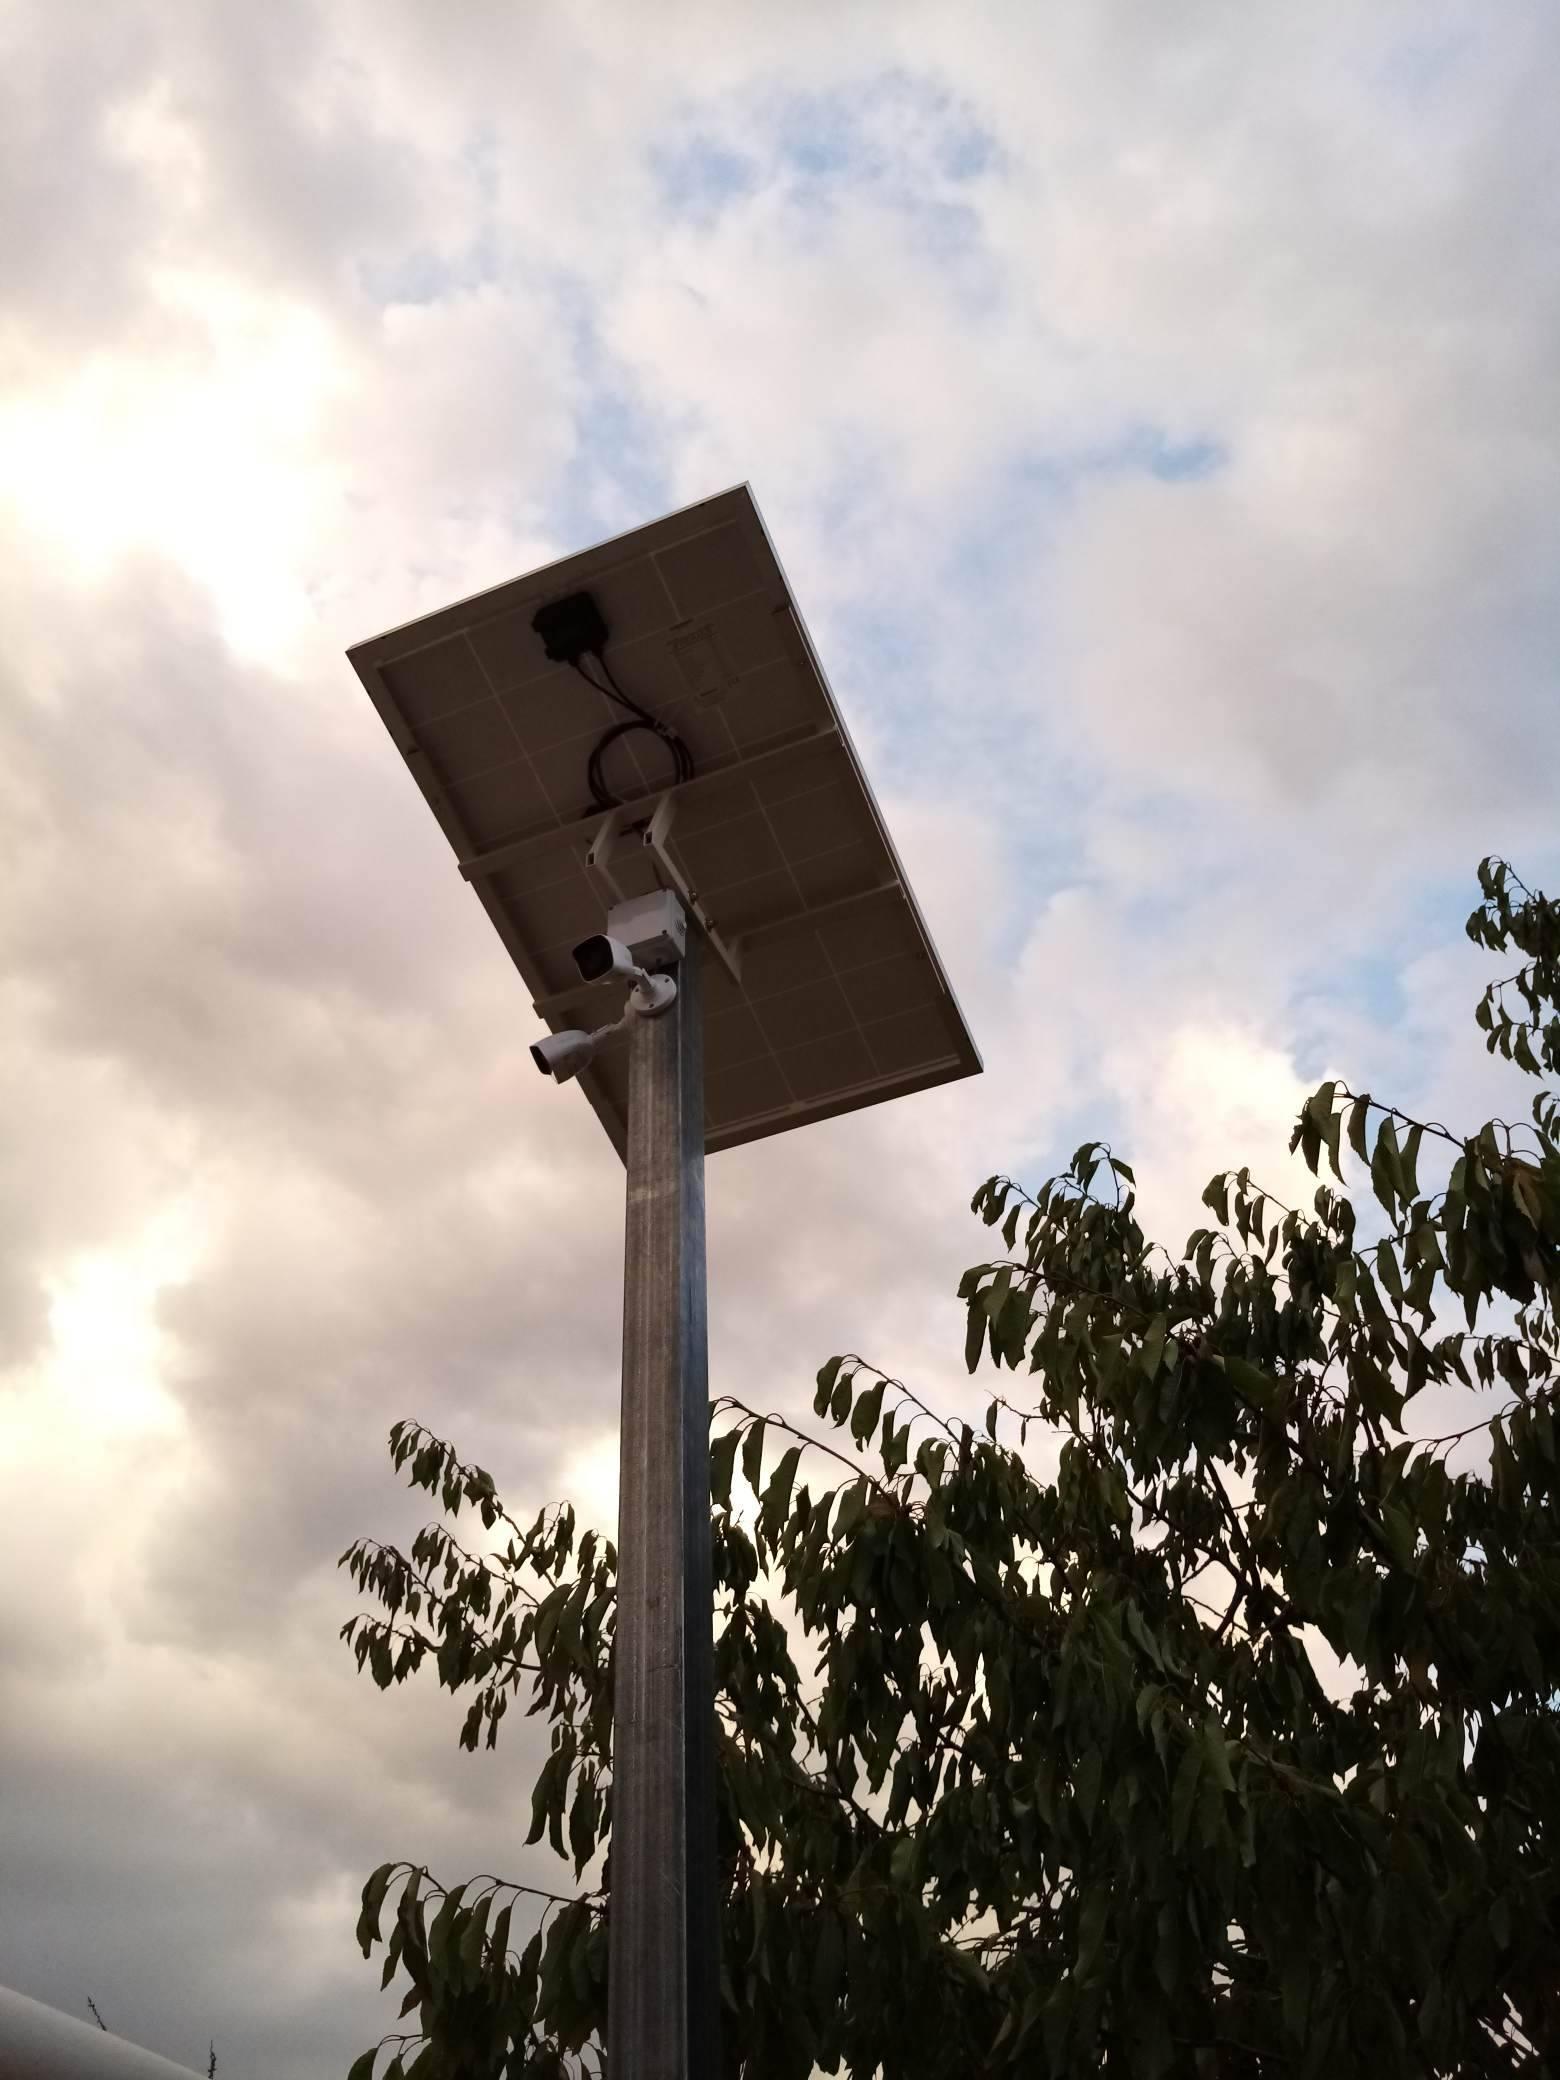 http://www.energialternativa.info/public/newforum/ForumEA/U/telecamera-1.jpg